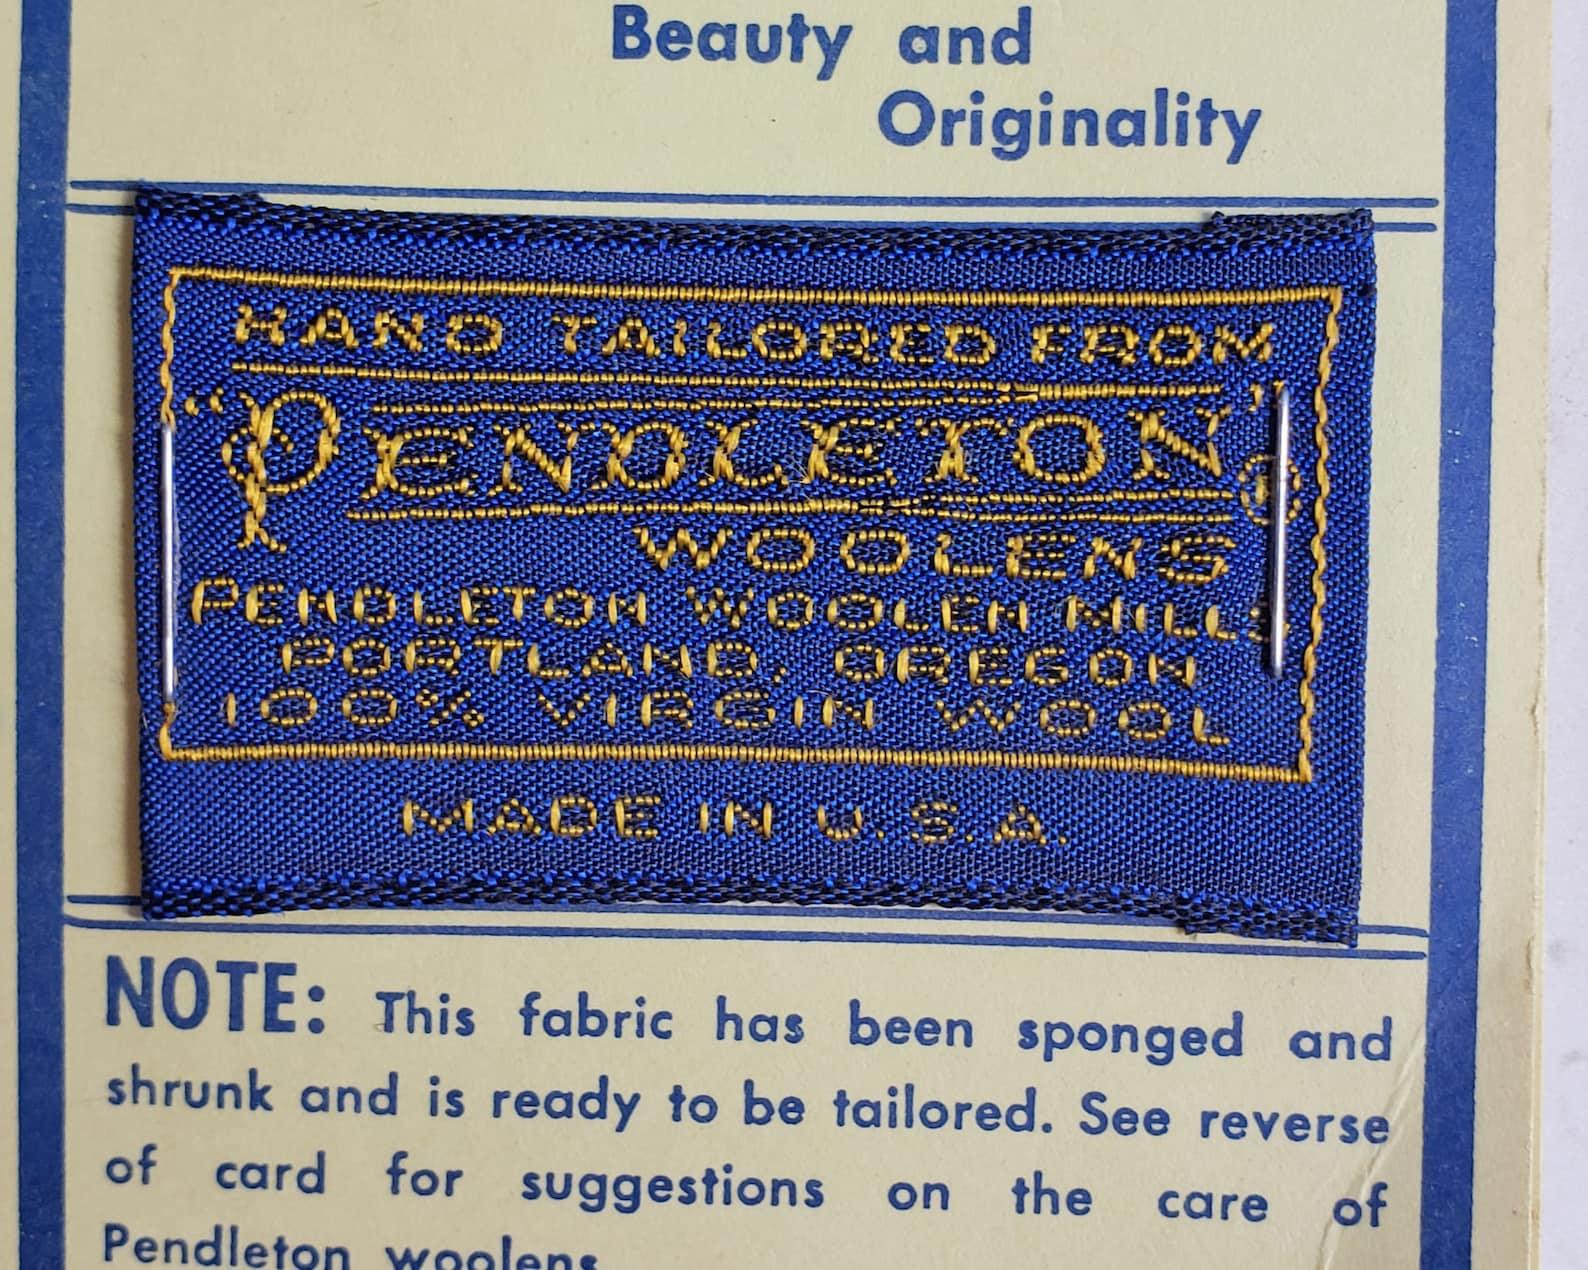 Vintage Pendleton Woolen Mills Clothing Sew On Label | Etsy